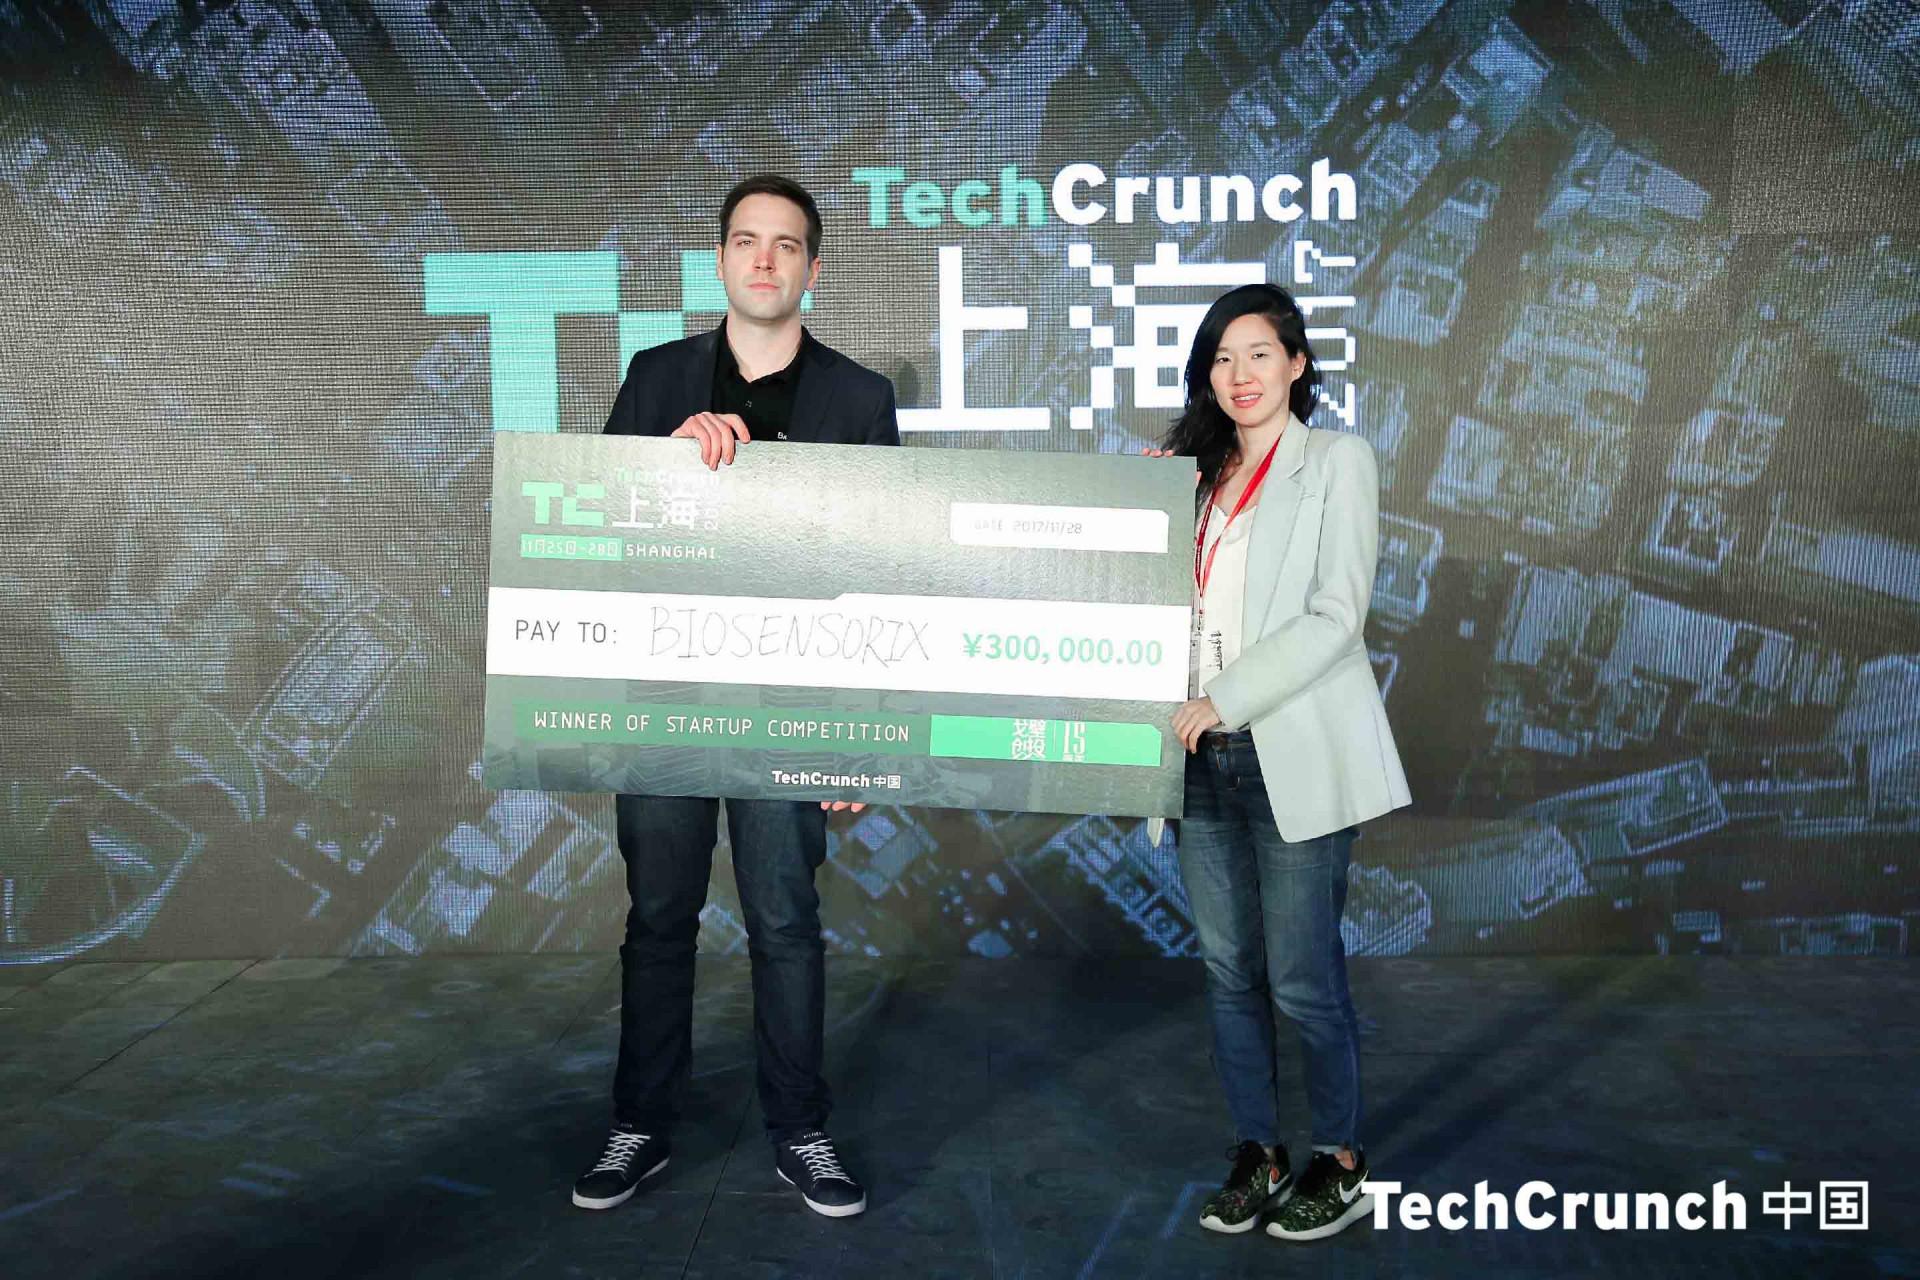 Biosensorix co-founder Luka Fajs receiving his check (Image credit: TechCrunch Shanghai)